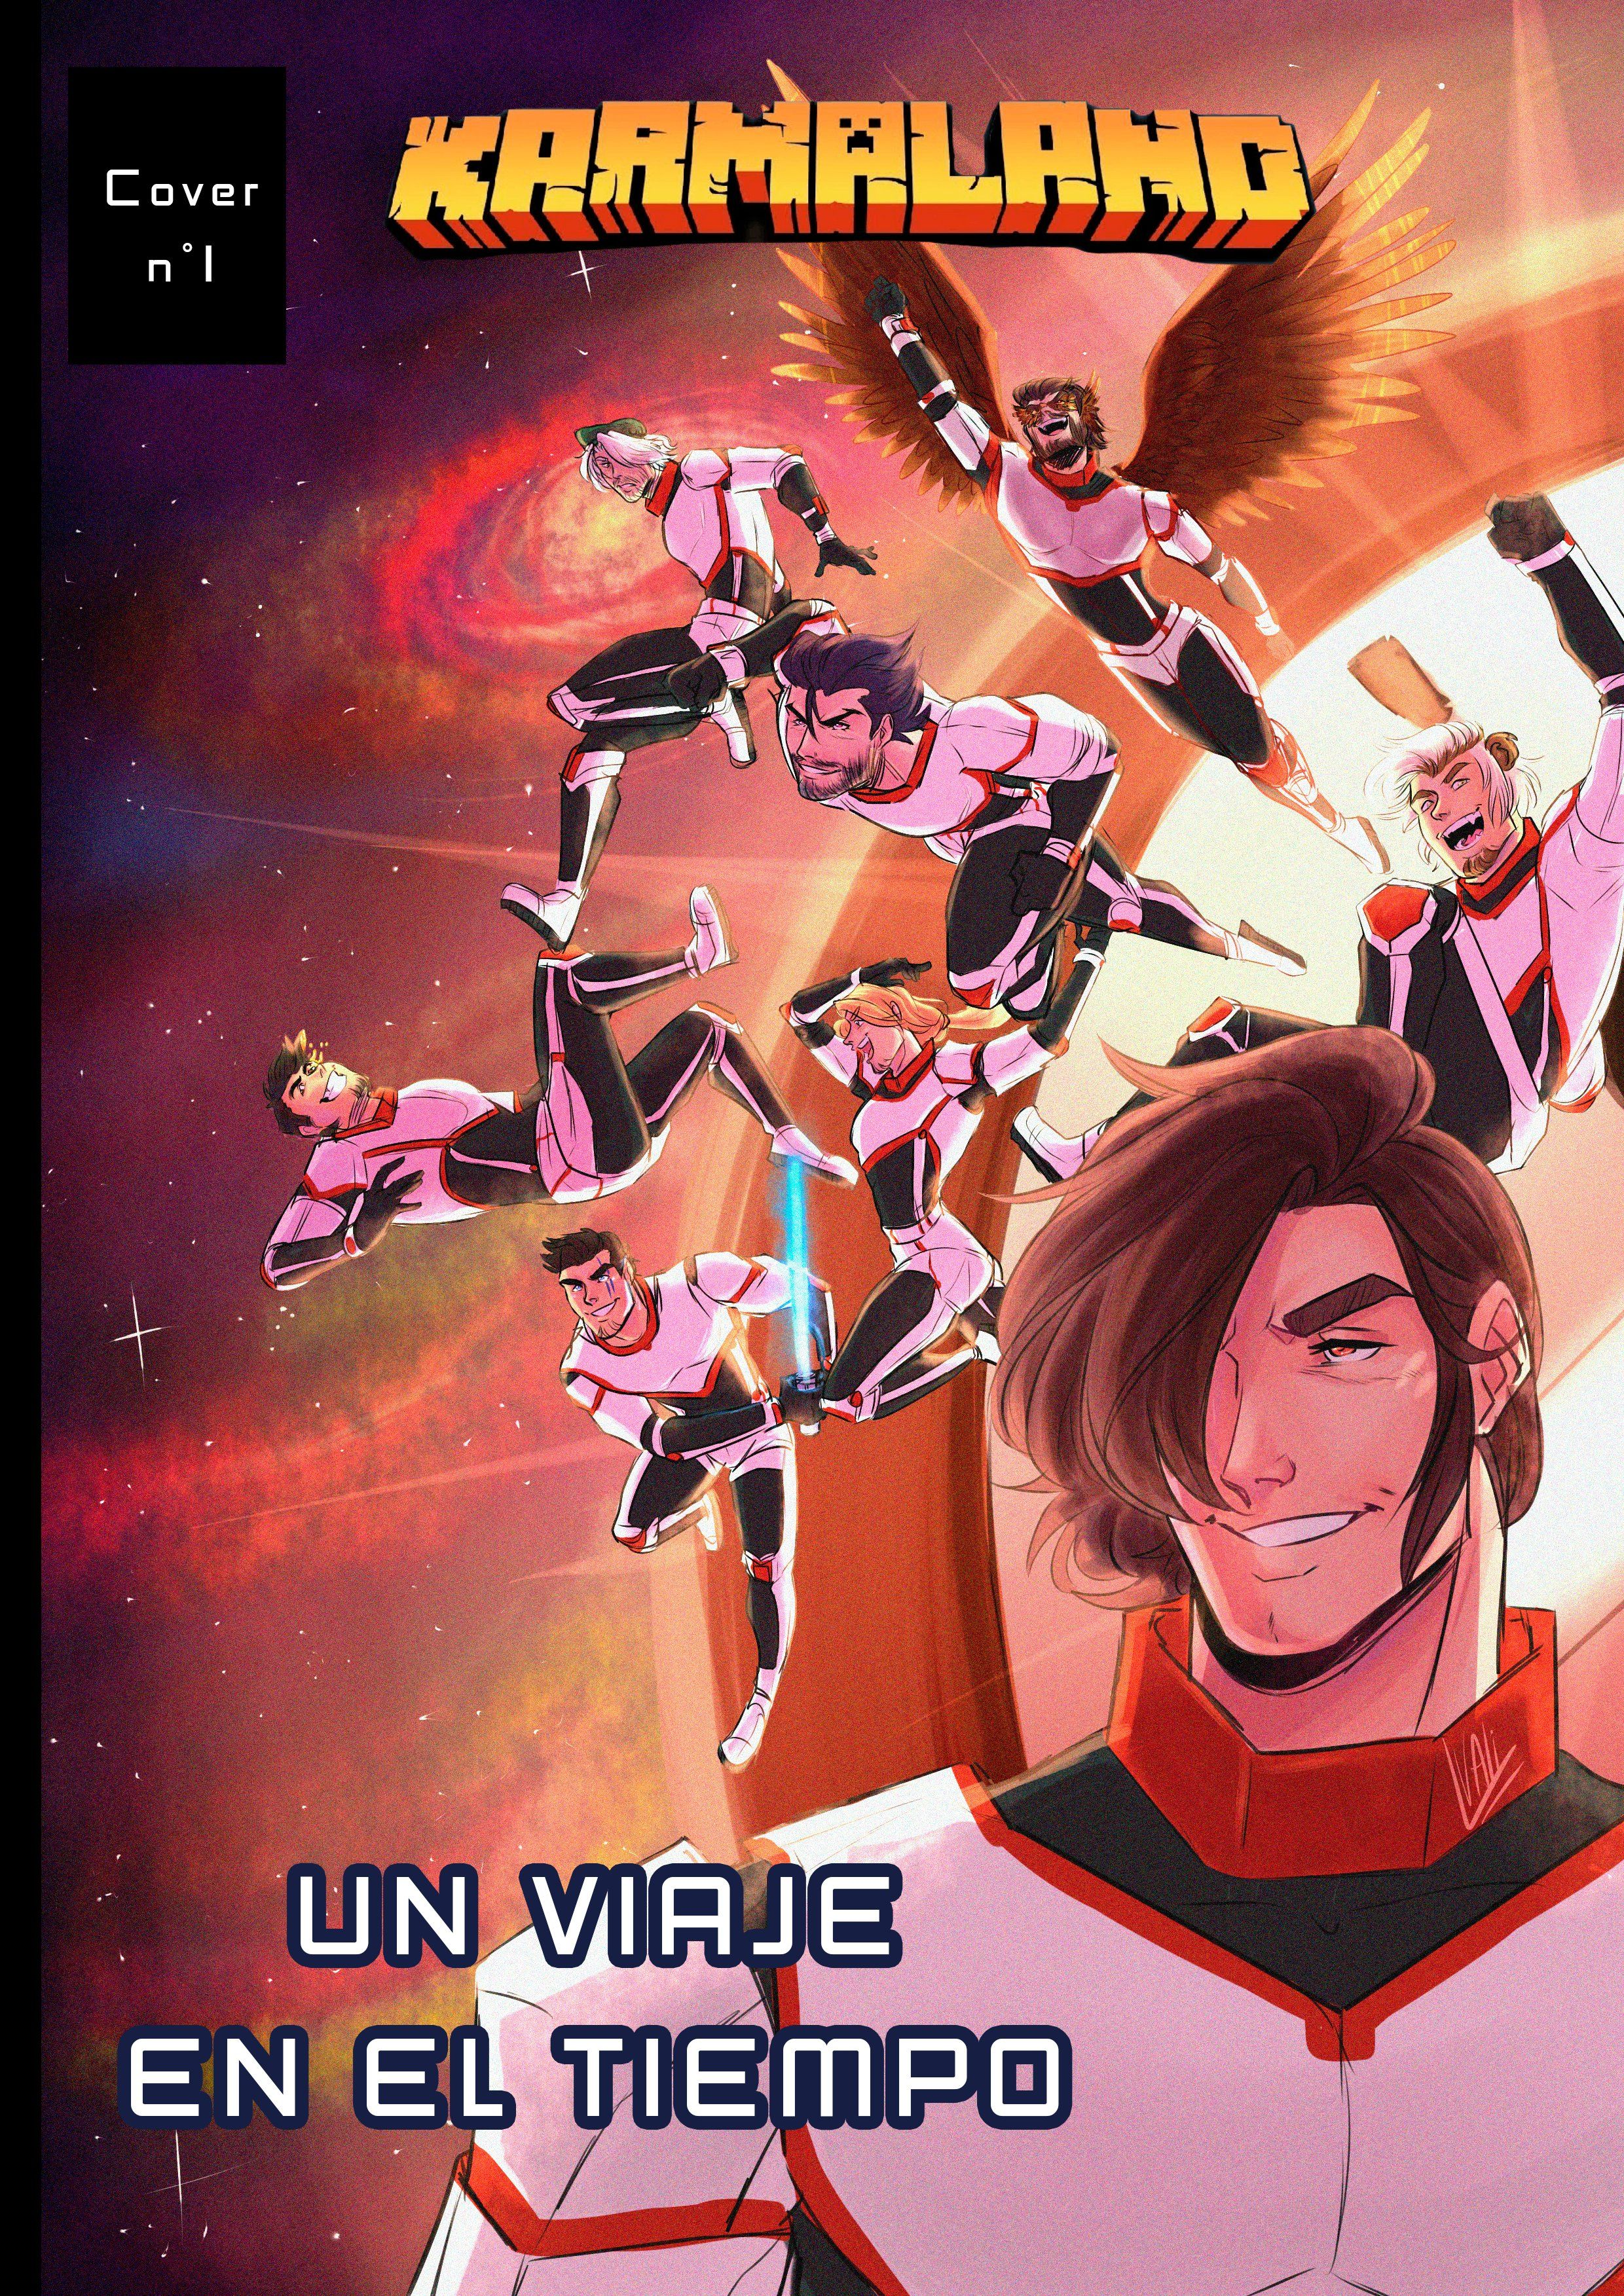 Val🍥 on Twitter in 2020 Kawaii anime, Youtubers, Otaku anime